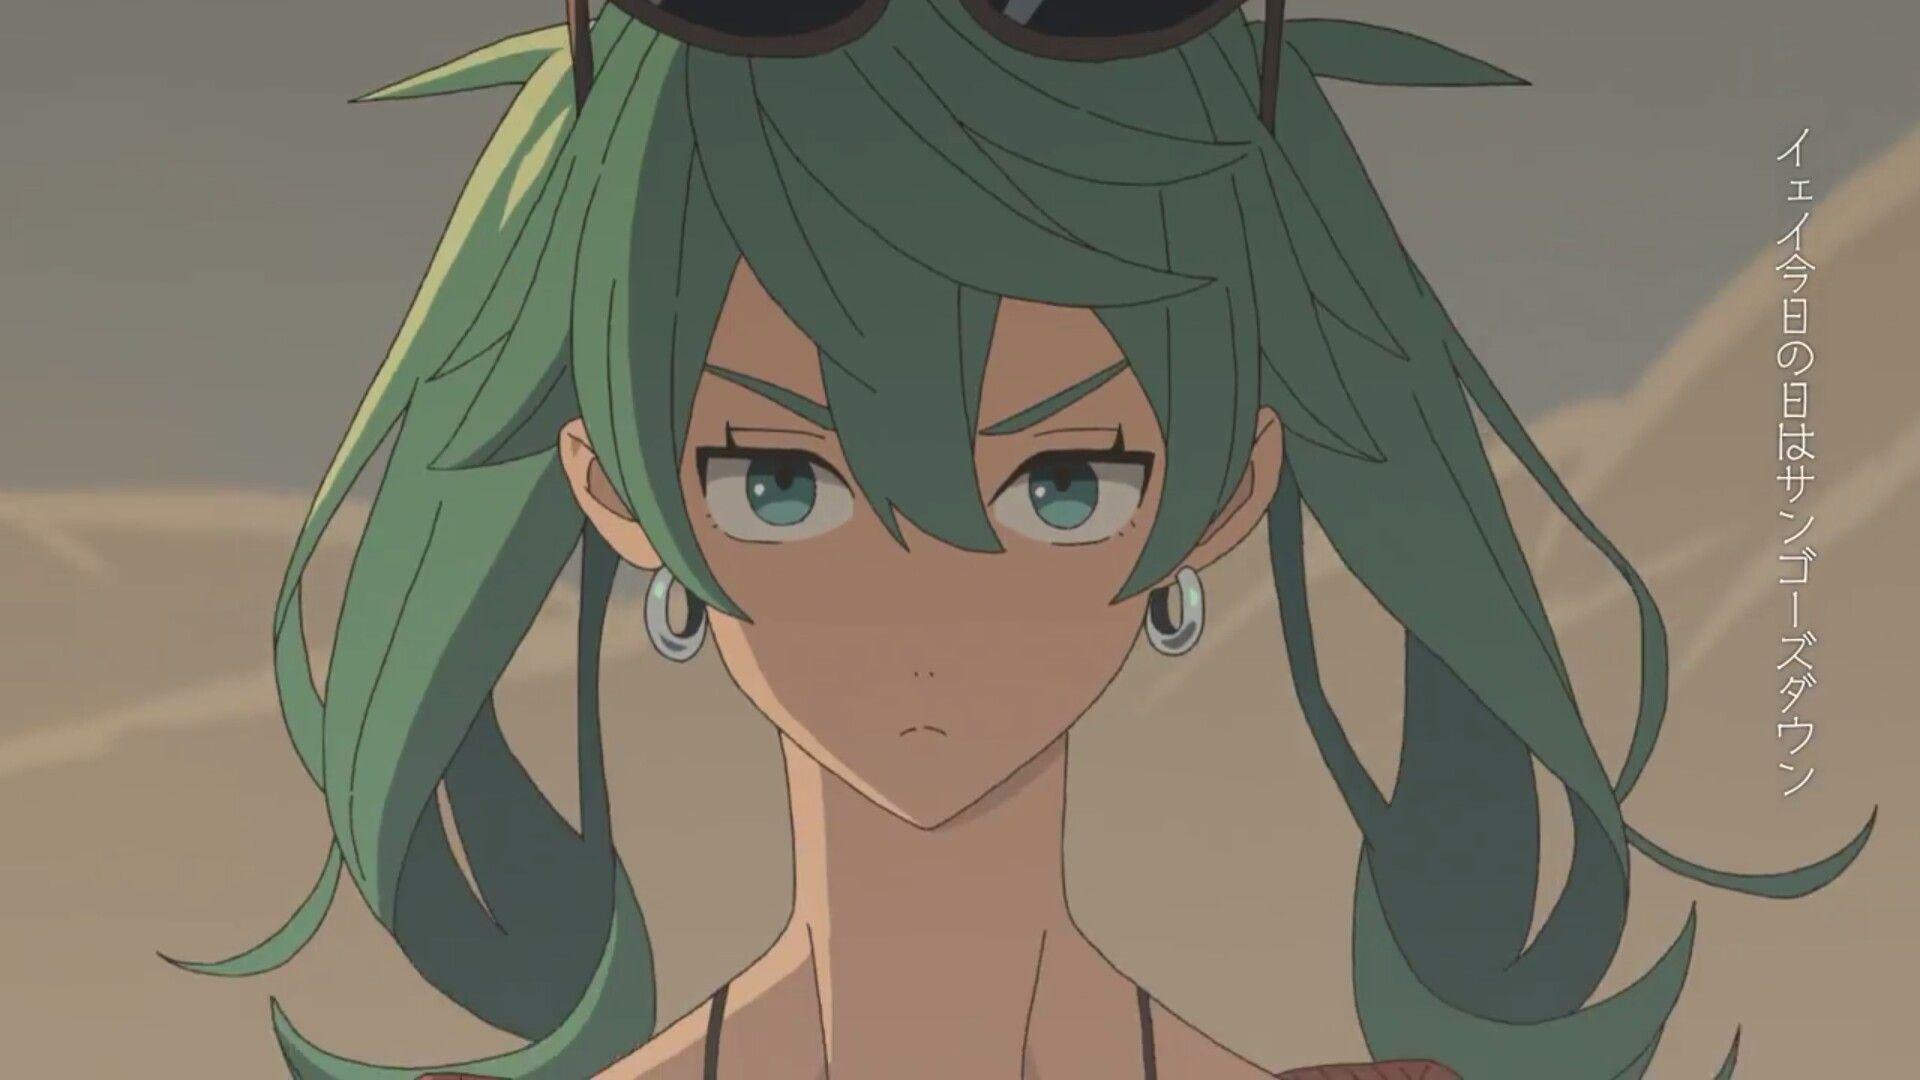 Hatsune miku sand hatsune miku miku anime